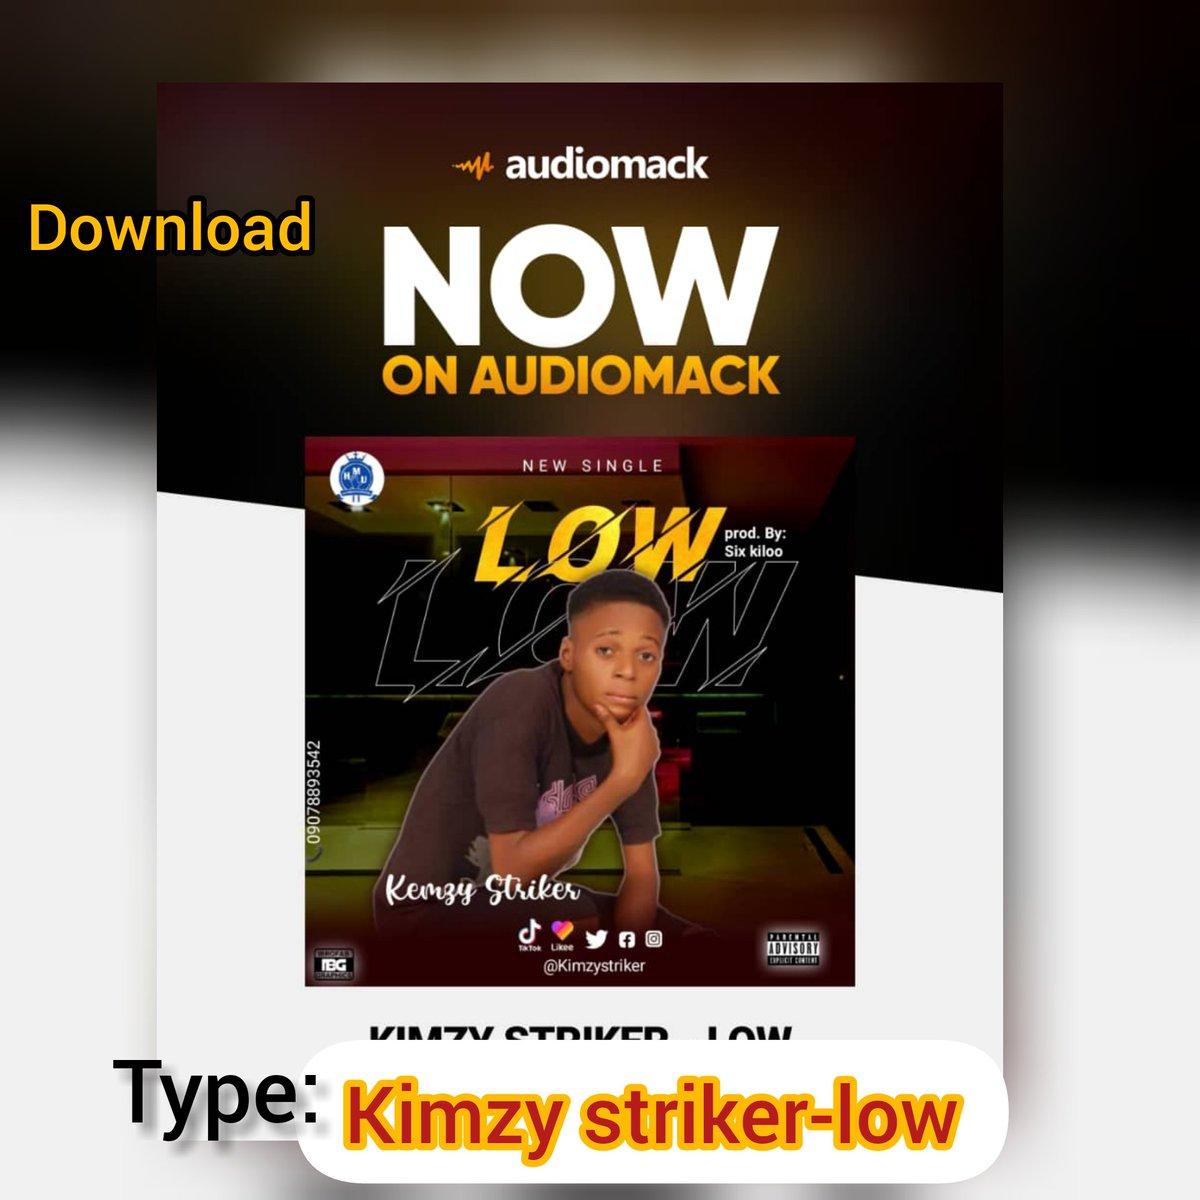 My song out on audio mack  Download and share @davido #davido @iamcardib #music #VideoViral #VeeiyeMusicChallenge